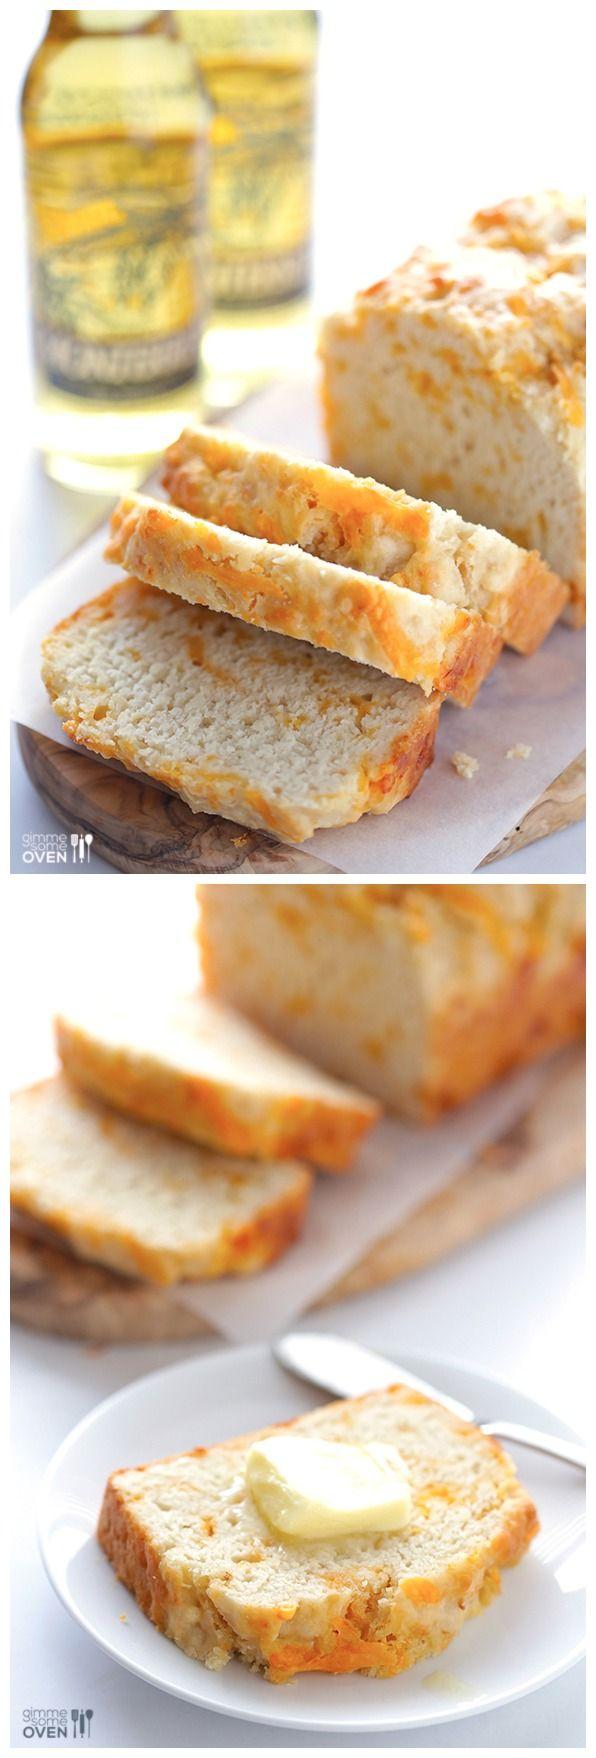 Garlic Cheddar Beer Bread Ingredients: 3 cups Baker's Corner All-Purpose Flour 2 tbsp. Baker's Corner Granulated Sugar 1 tbsp. Baker's Corner Baking Powder 1 tsp. Stonemill Essentials Iodized Salt …